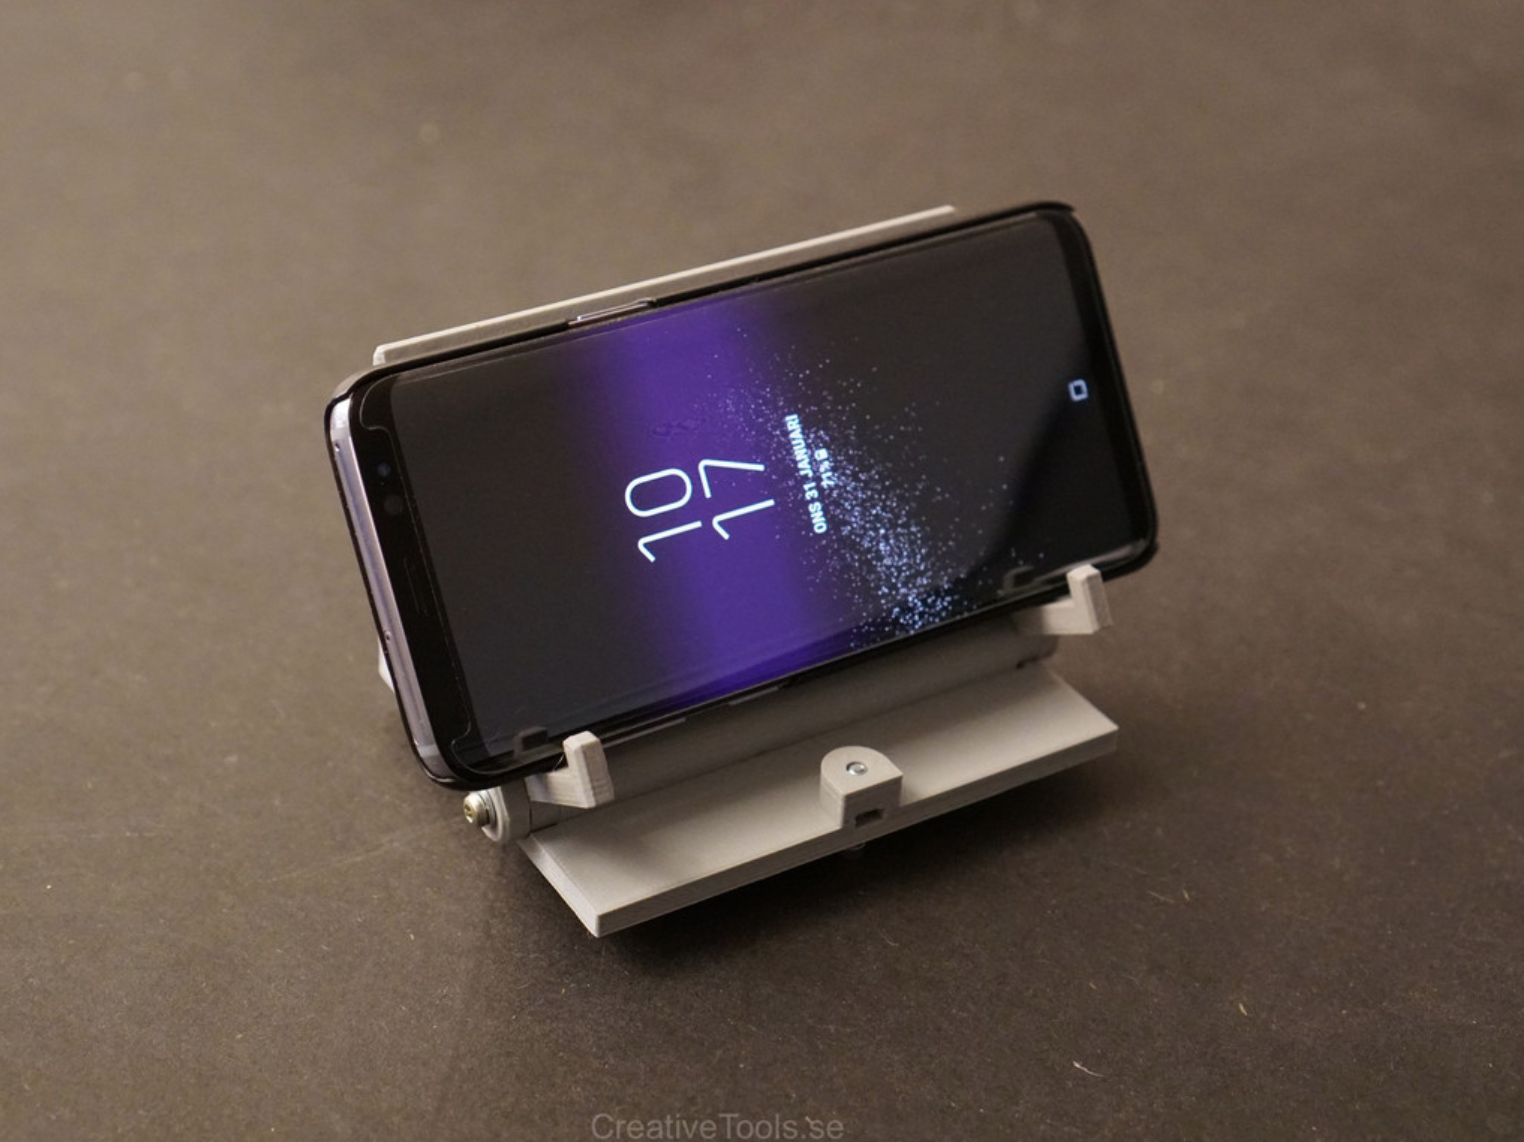 Capture d'écran 2018-01-31 à 18.05.41.png Download free STL file Smartphone Desktop Stand (adjustable angle) • 3D printer object, CreativeTools